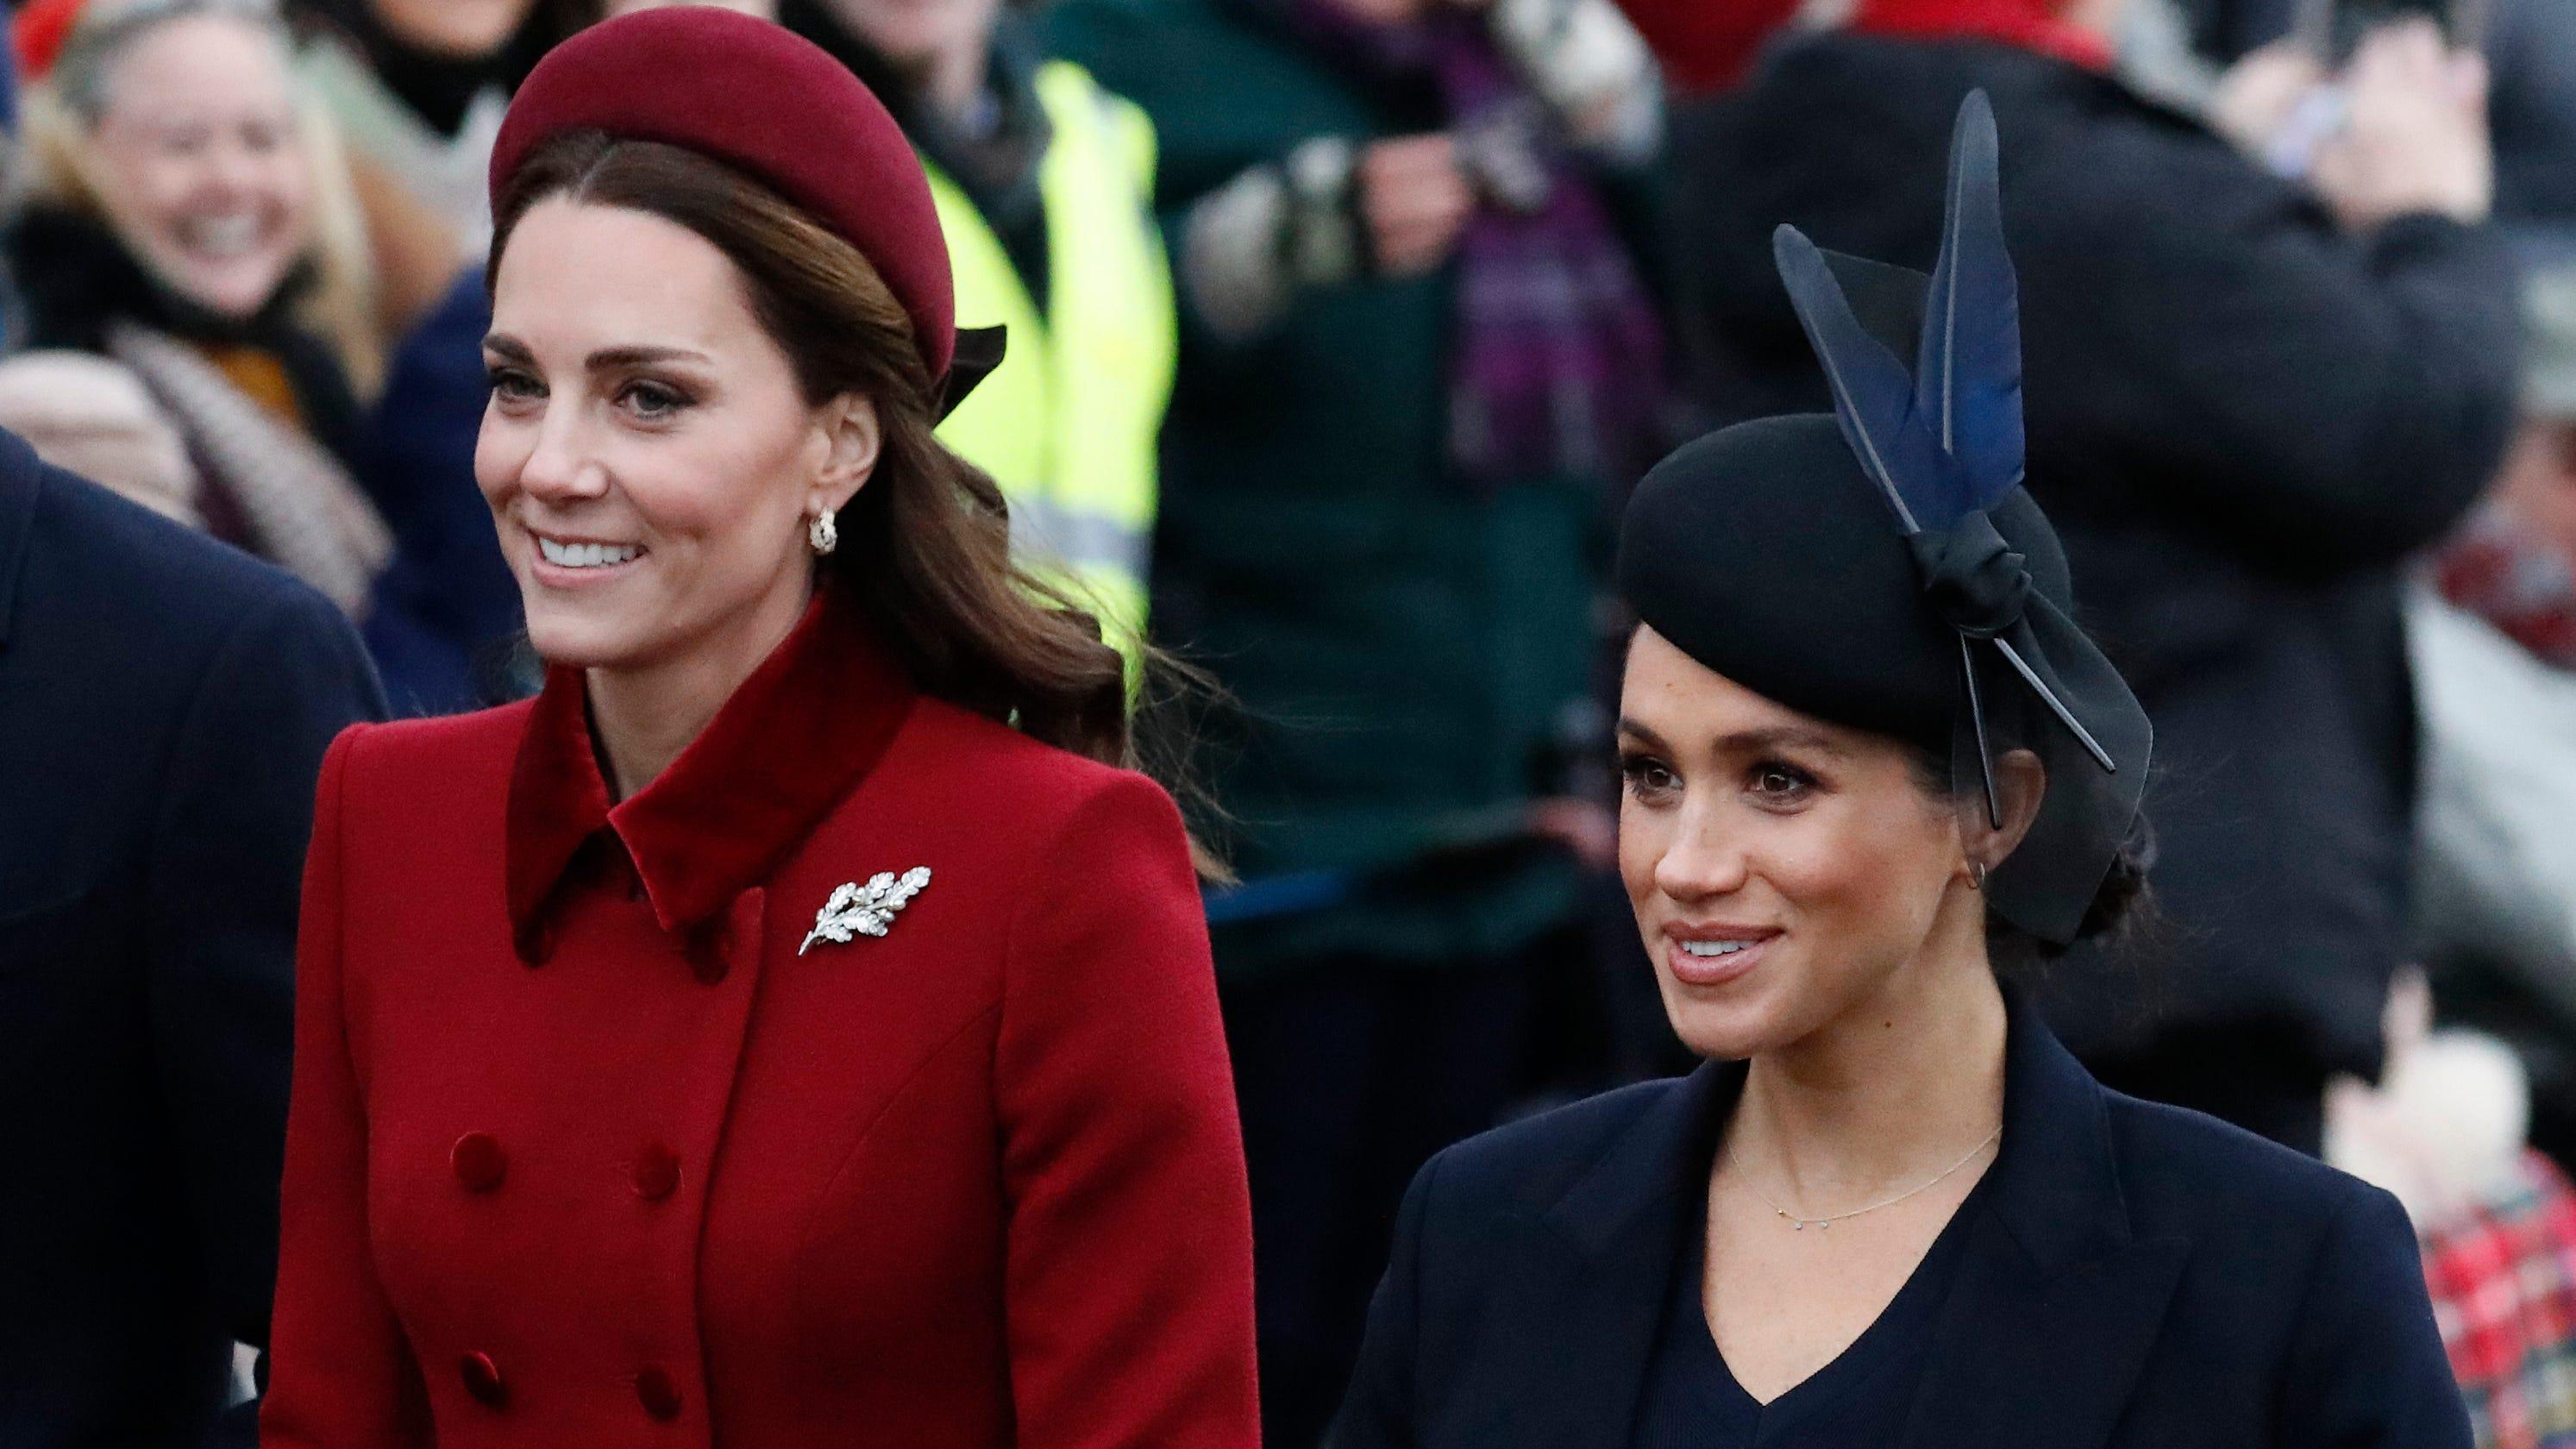 Kate V Meghan Princesses At War Investigated Rumored Royal Feud